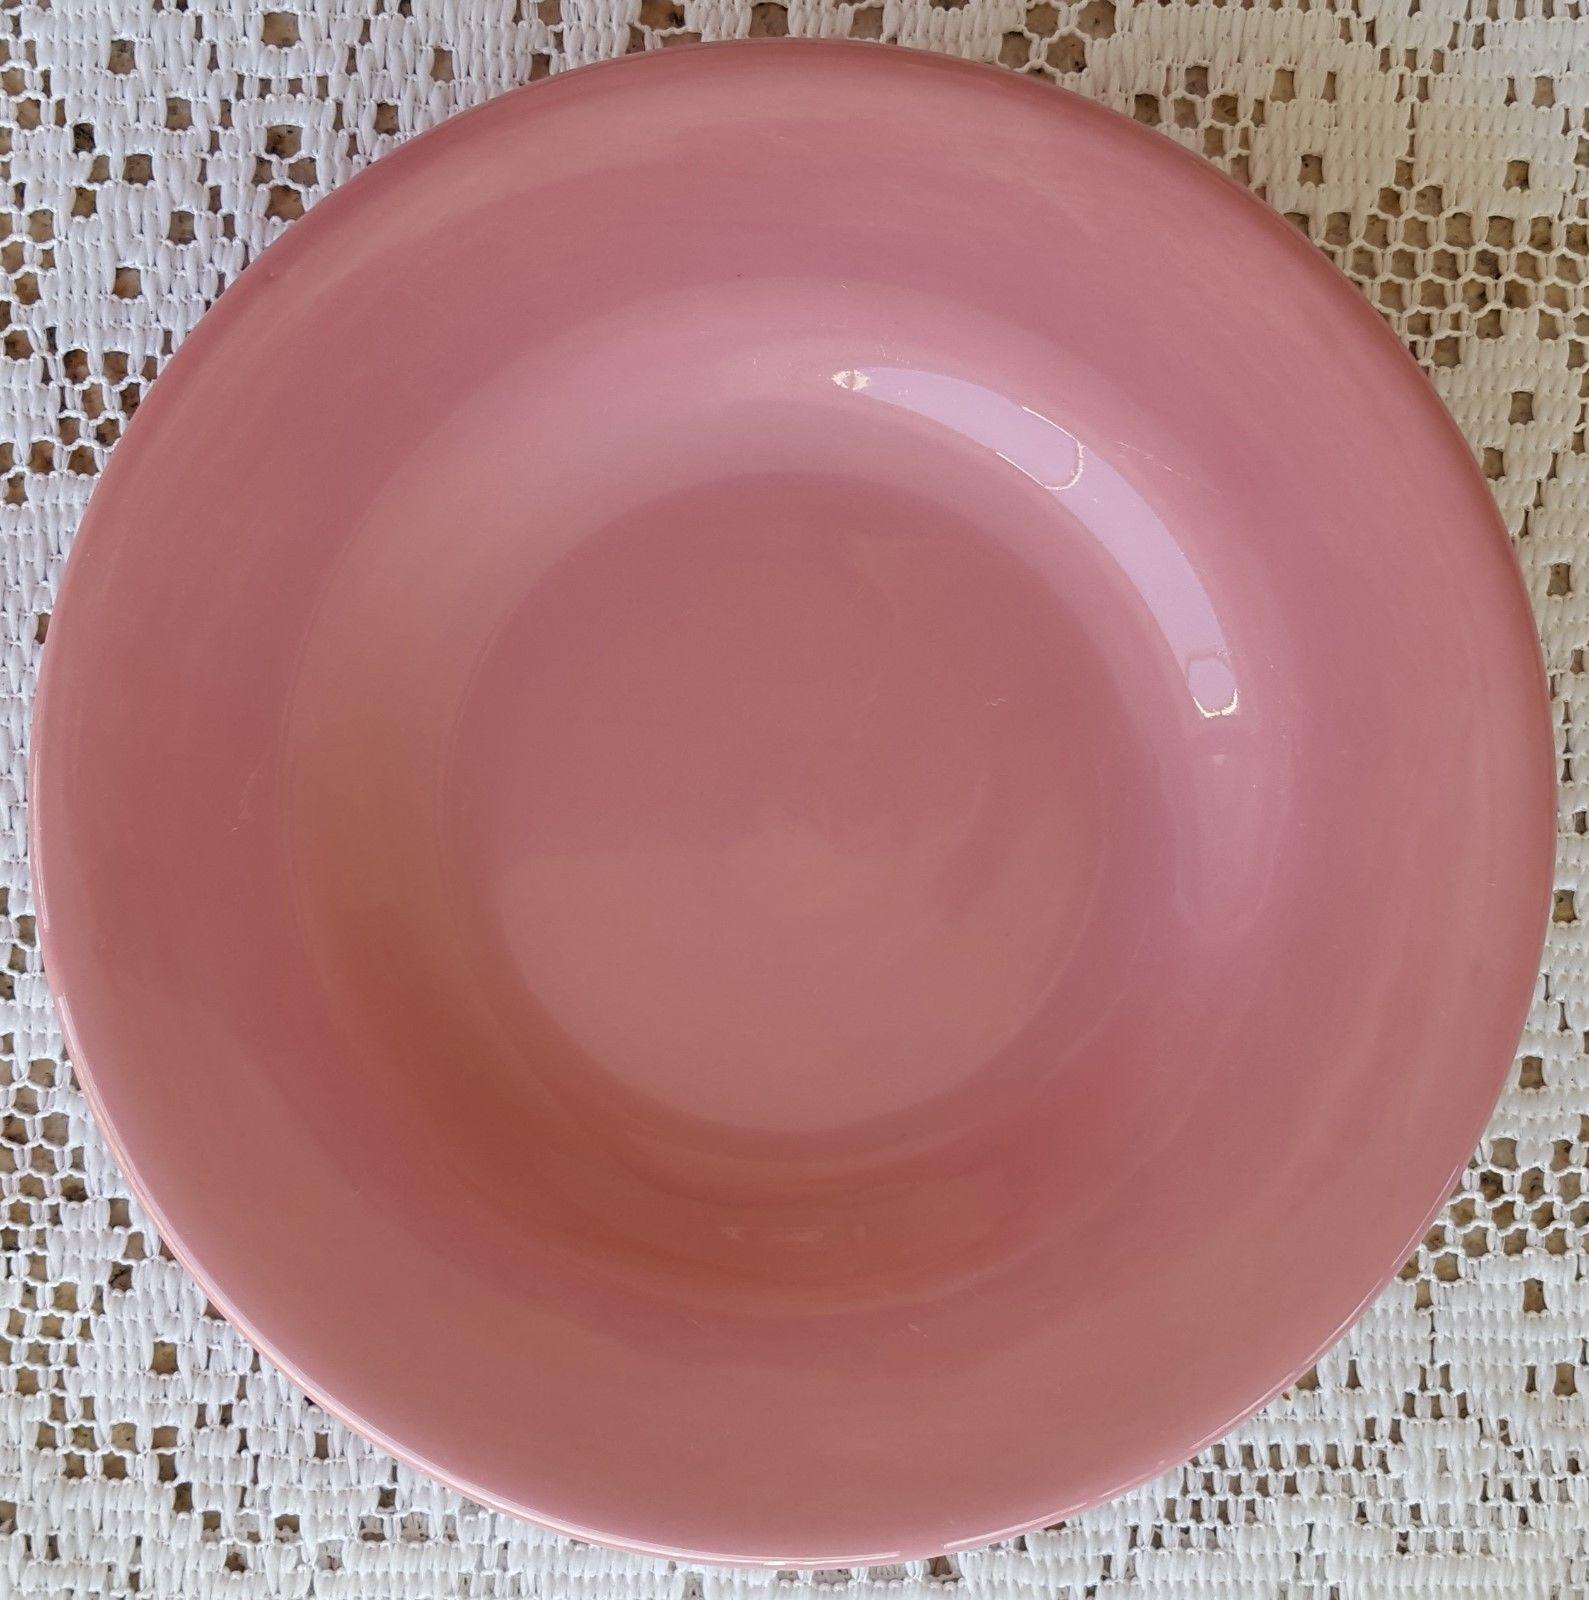 ... Hausenware Pink Dinnerware Stoneware Dinner and Salad Plates 3 Pieces ...  sc 1 st  Bonanza & Hausenware Pink Dinnerware Stoneware Dinner and 47 similar items